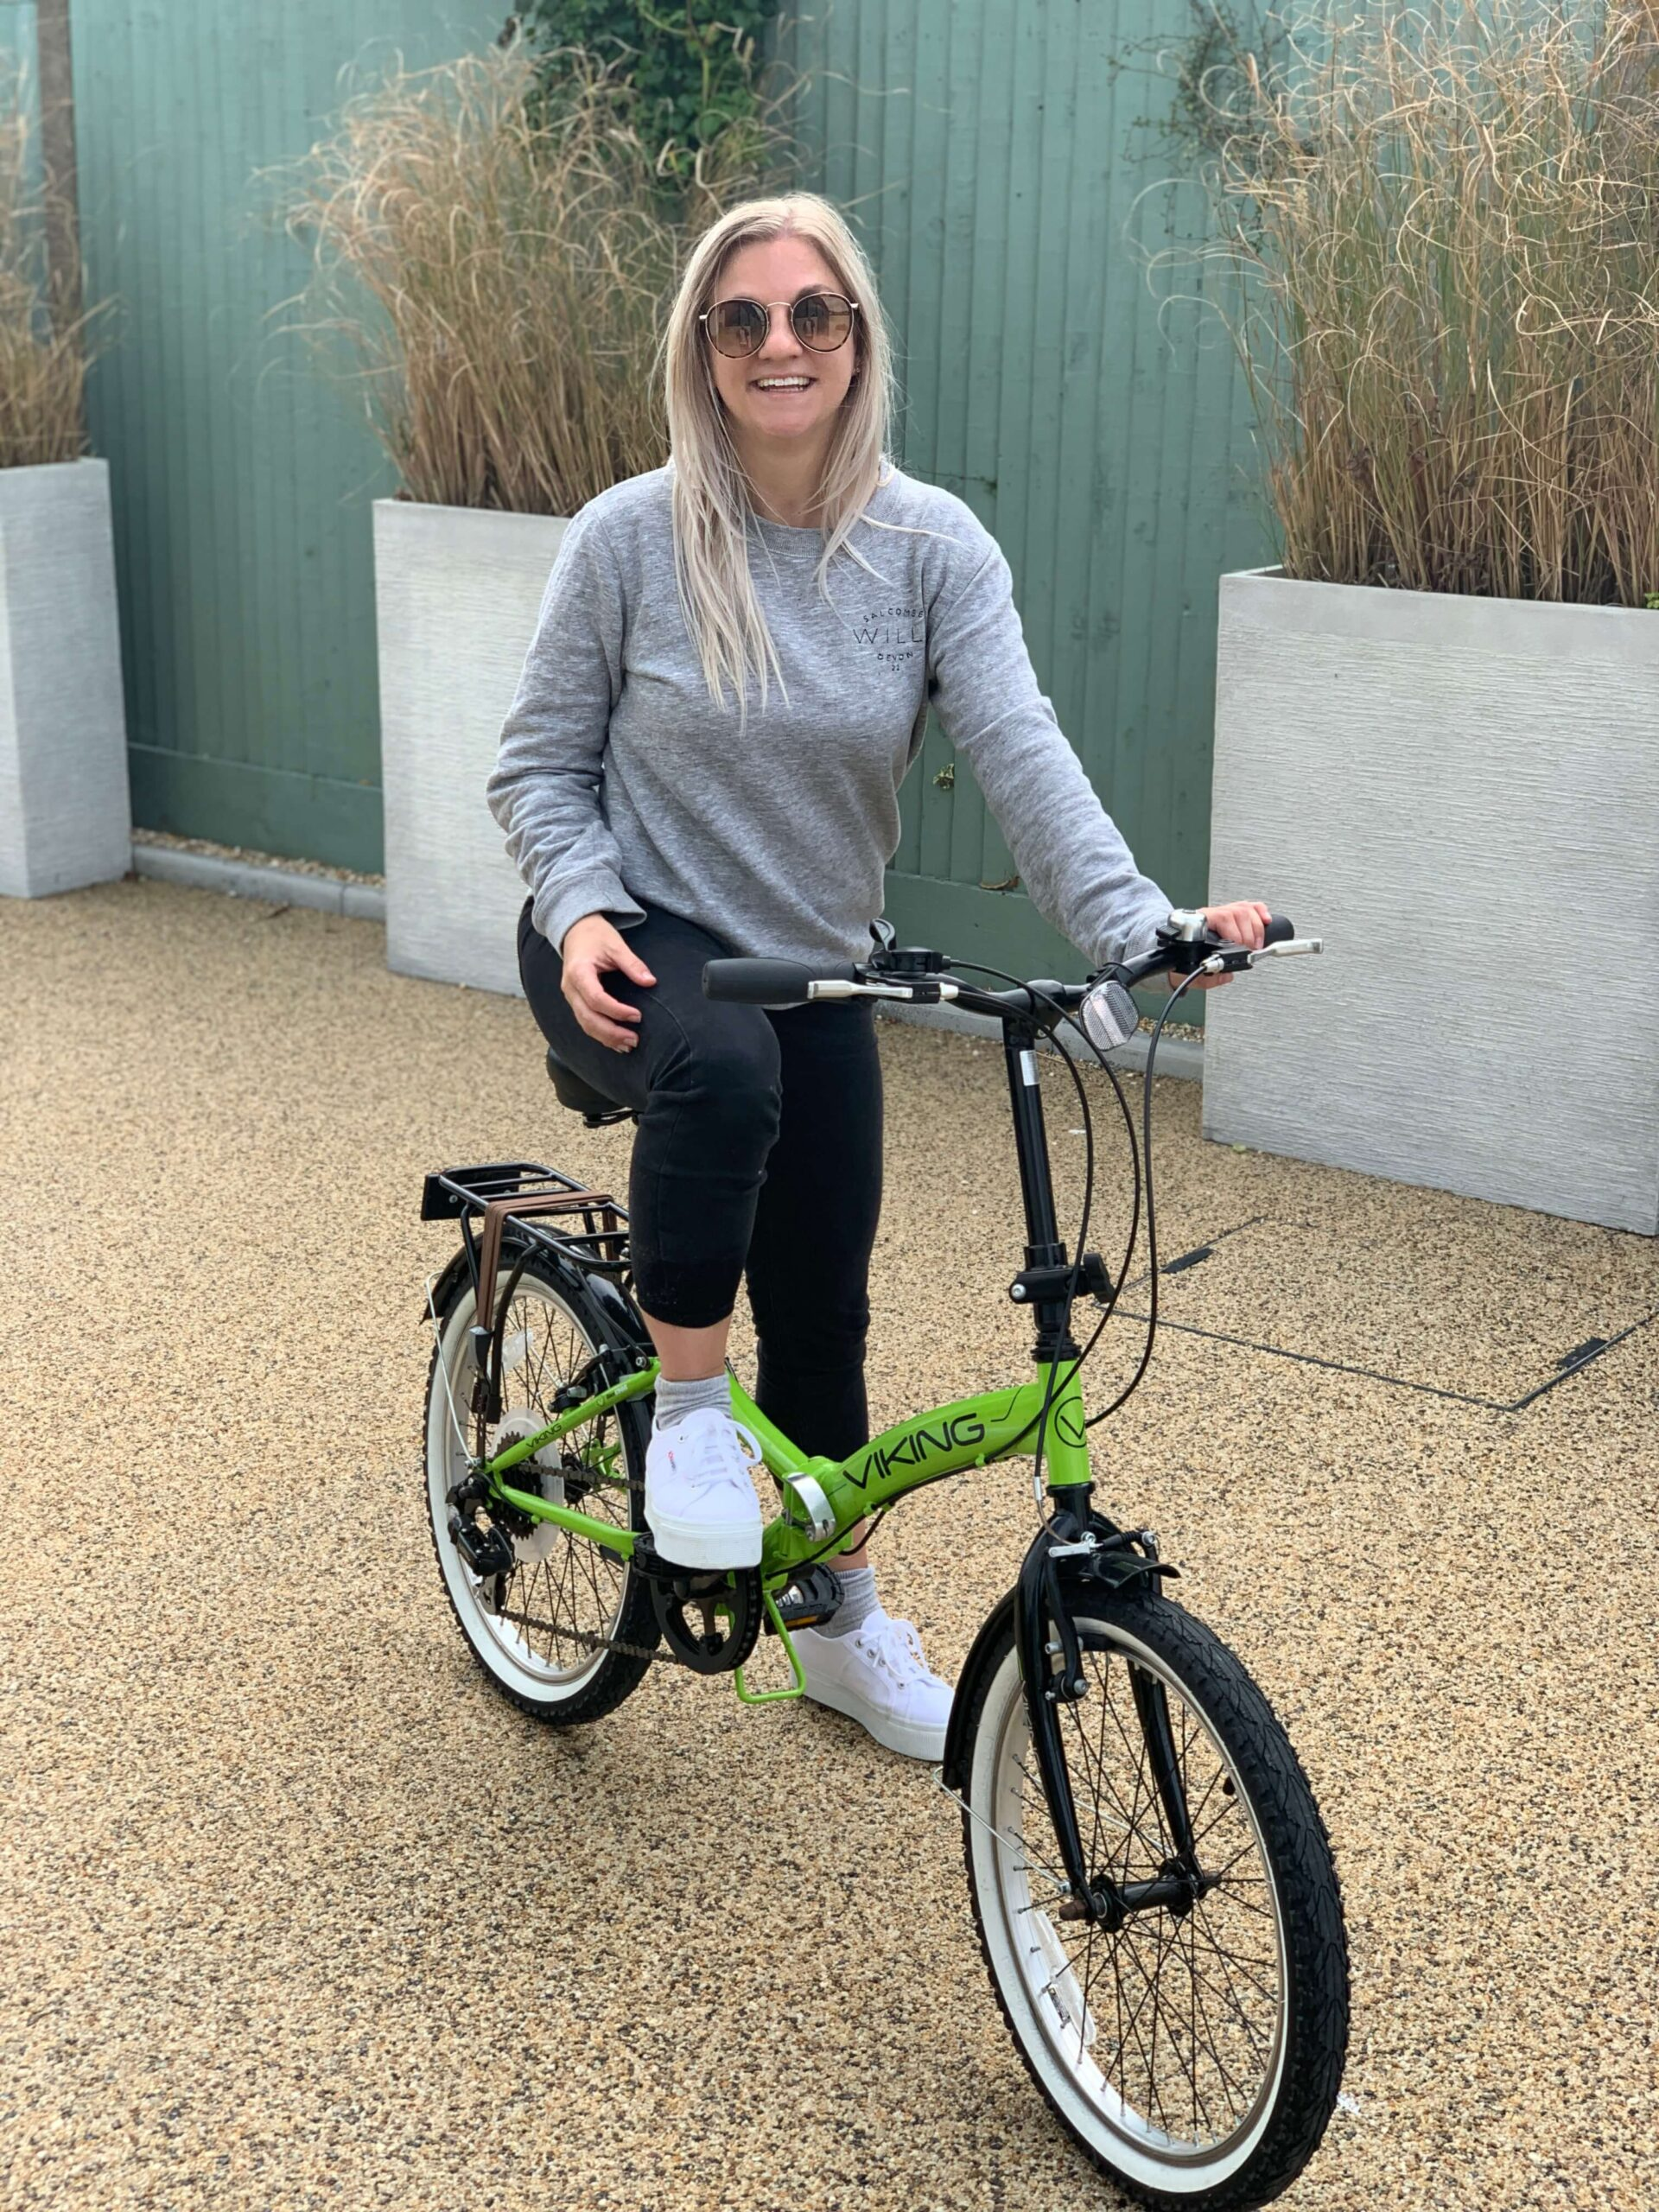 Woman sitting on a bike